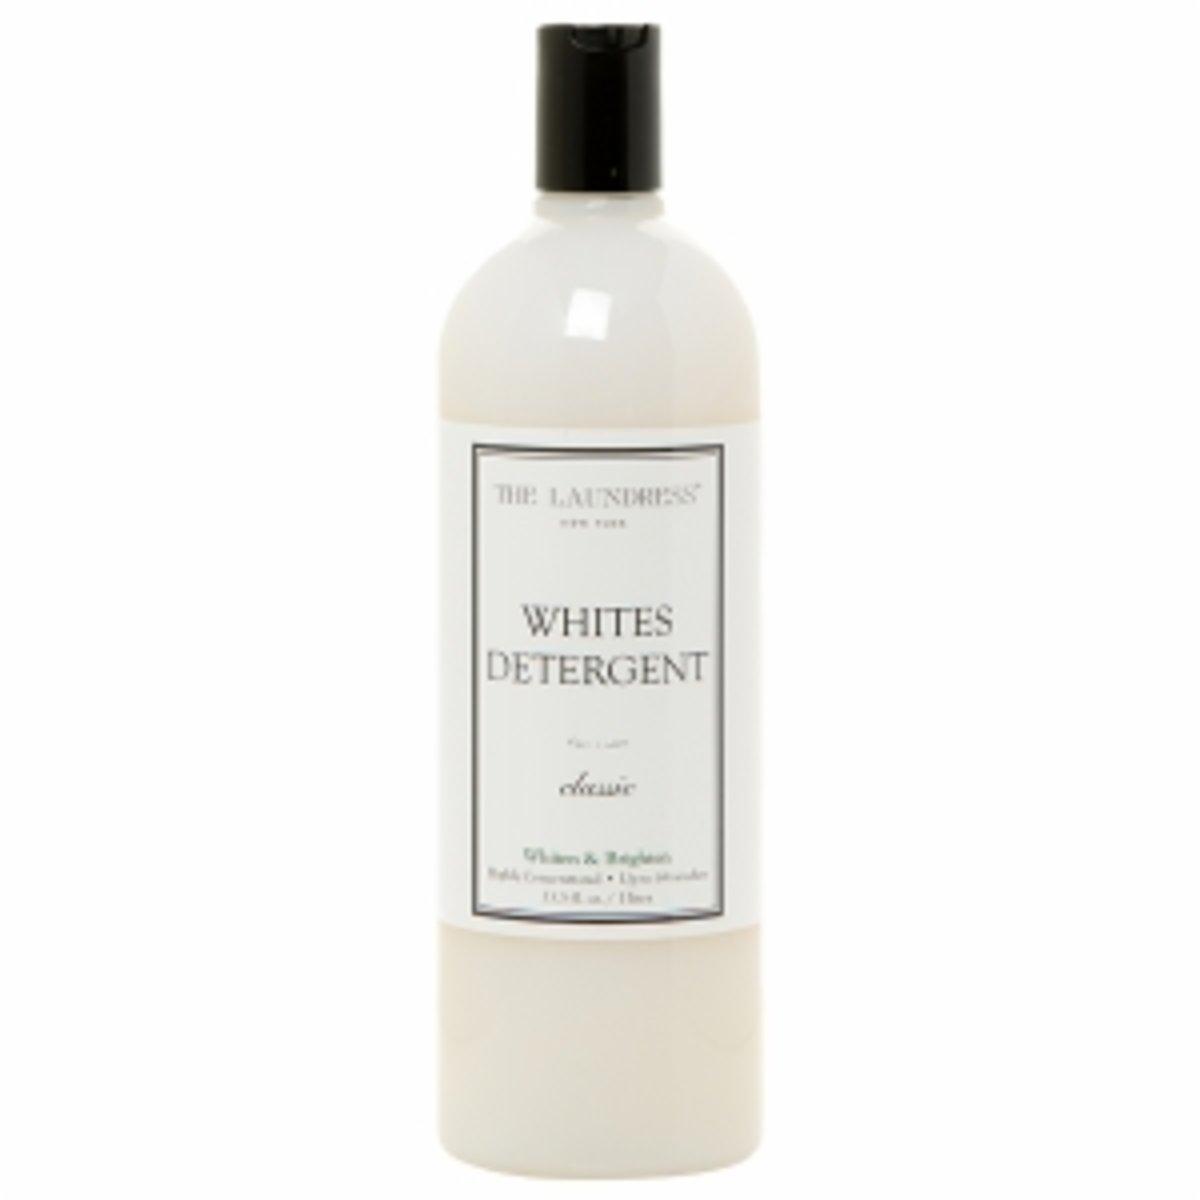 Whites Detergent Classic 33.3 fl oz